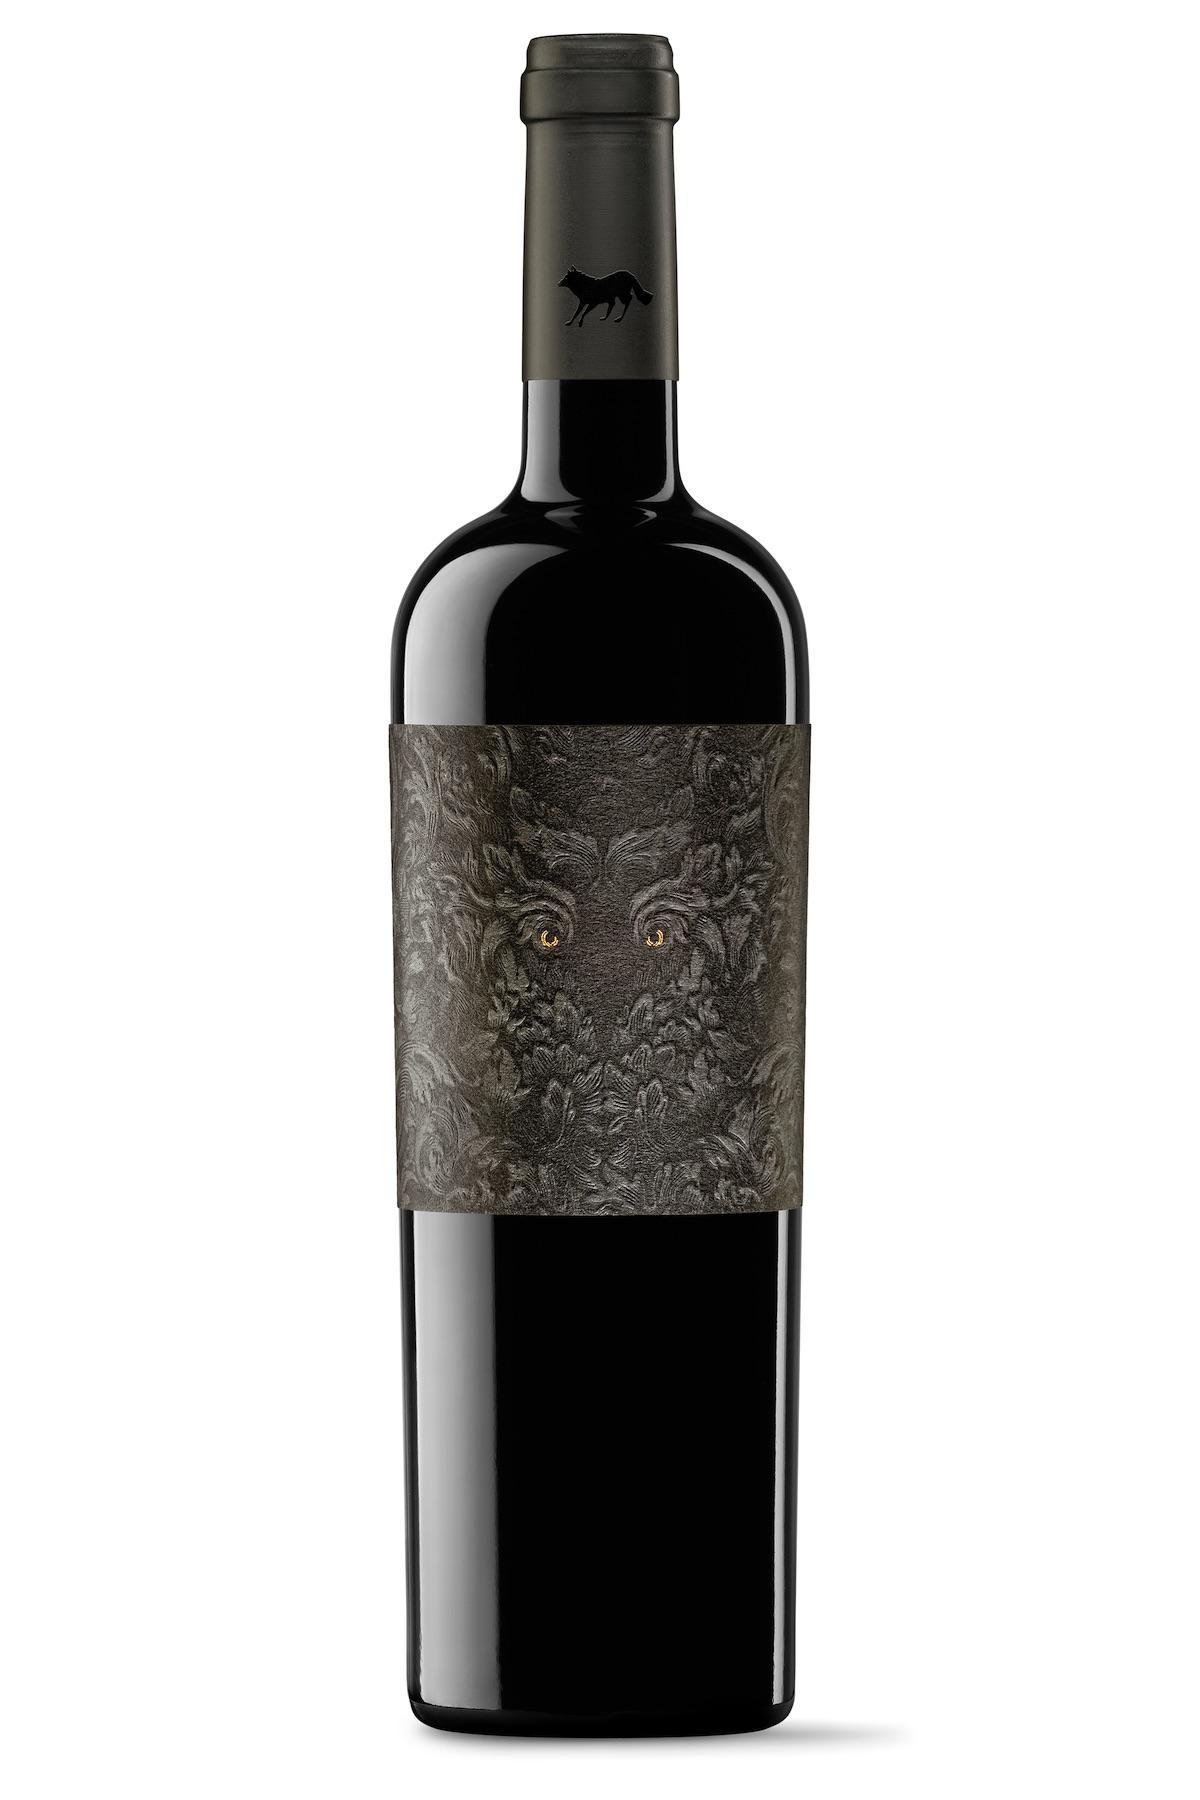 the villain wine label